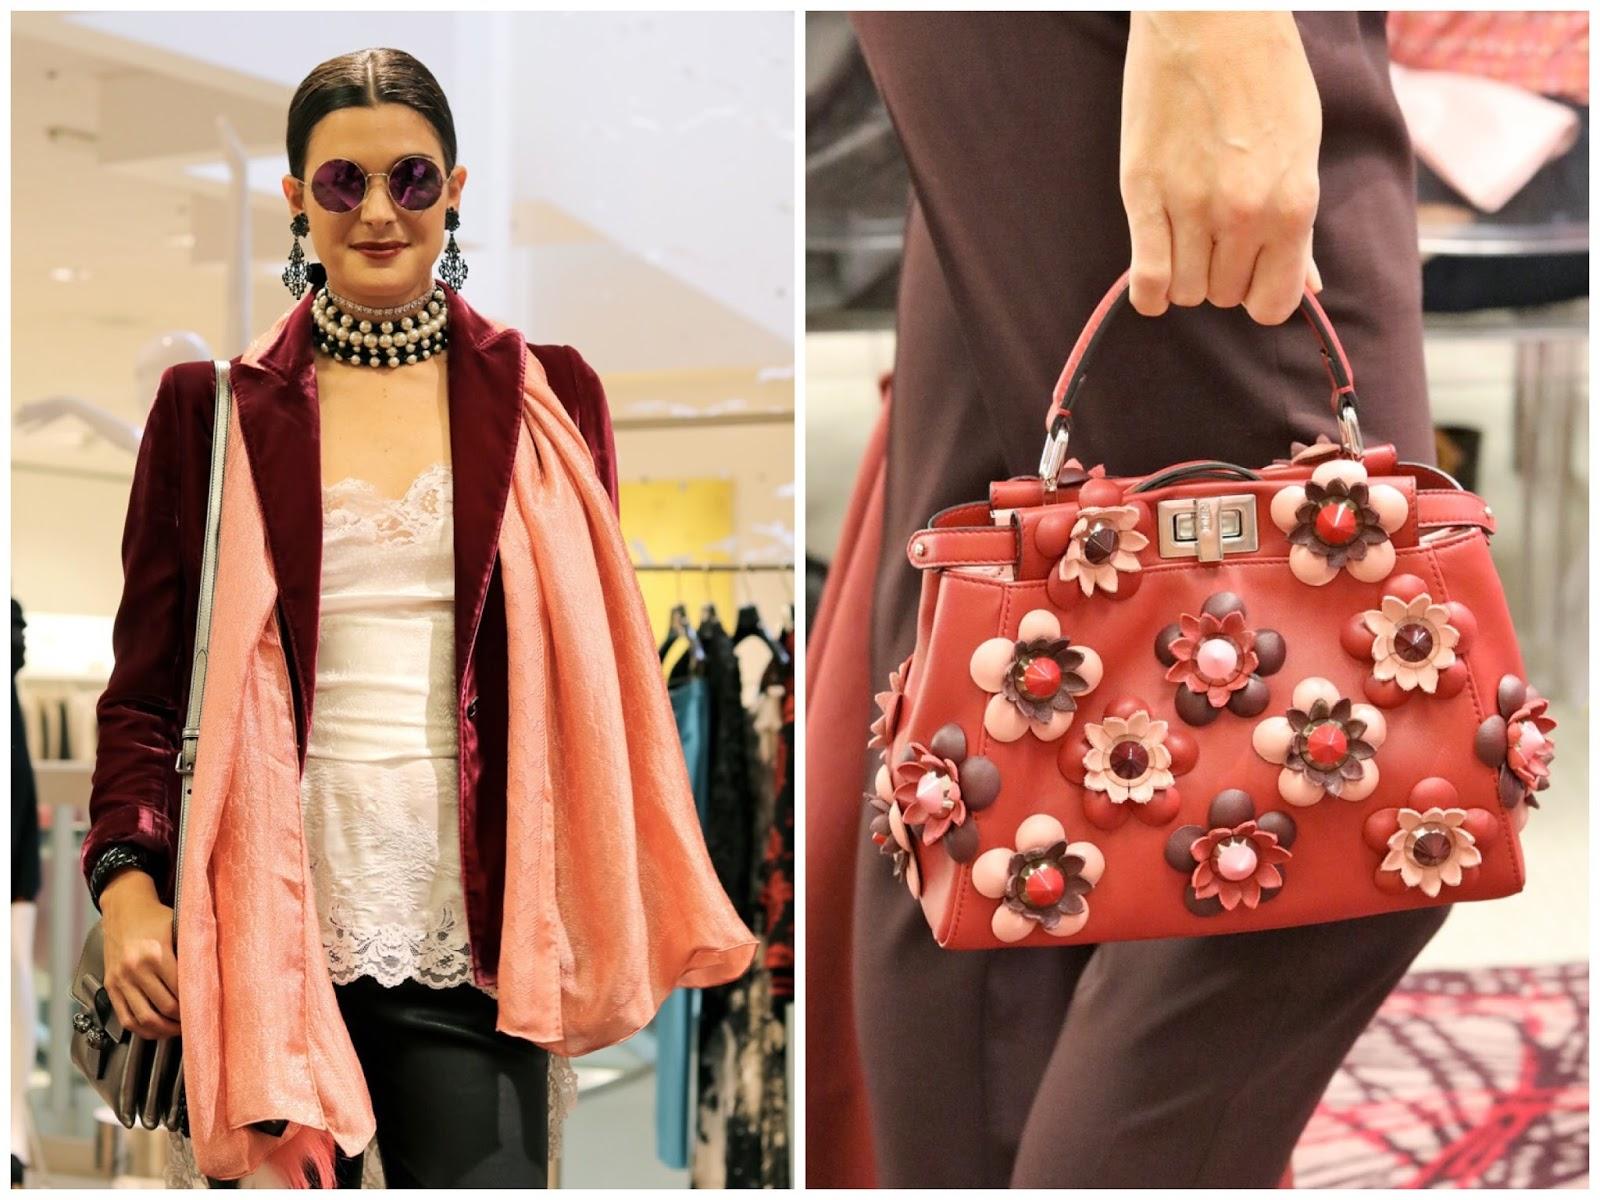 statement choker, fall 2016 chokers, choker trend 2016, top handle purses, top handle handbag